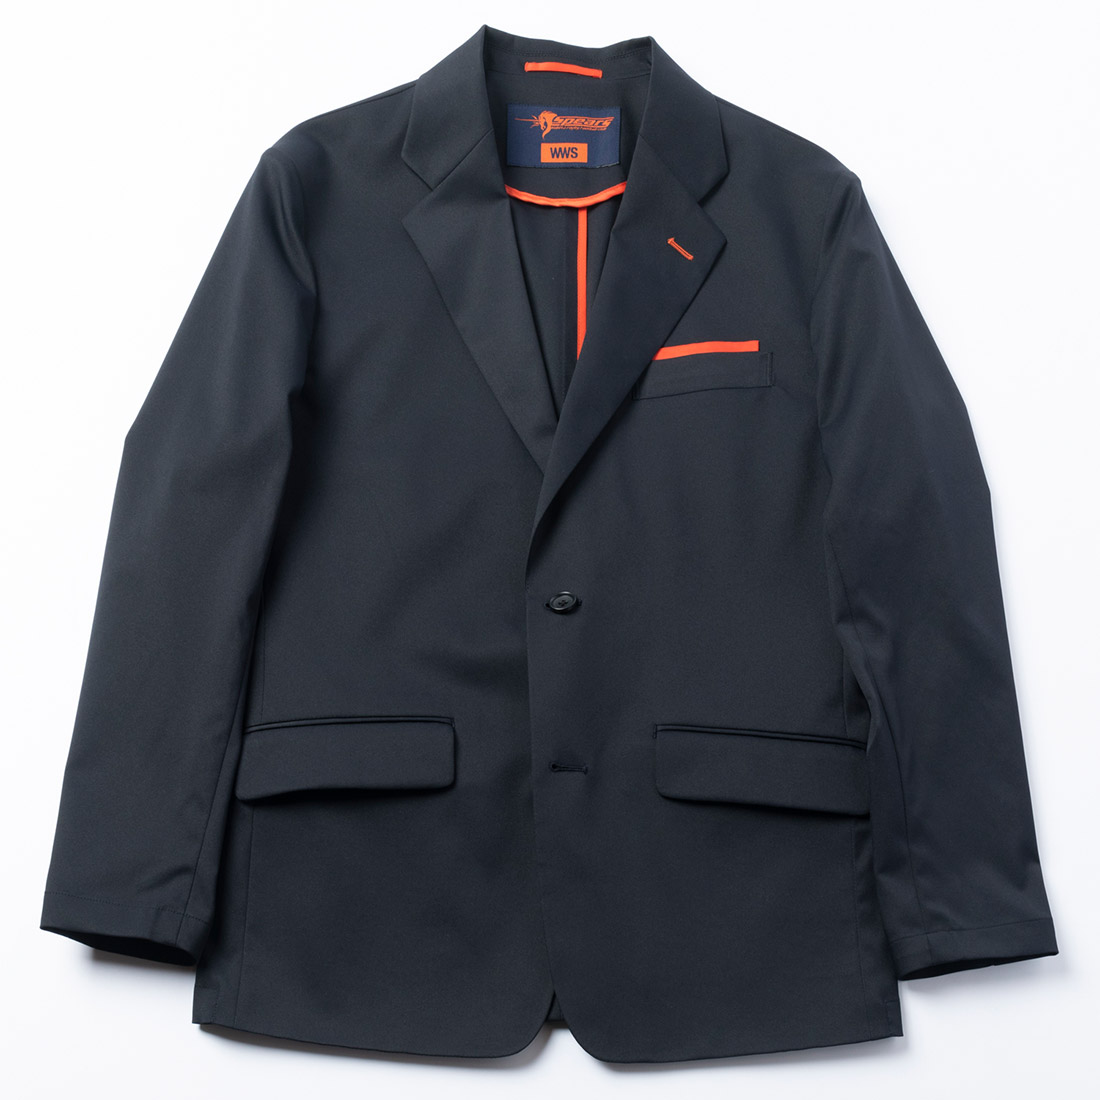 WWS×クボタスピアーズ船橋・東京ベイオフィシャルスーツ ジャケット